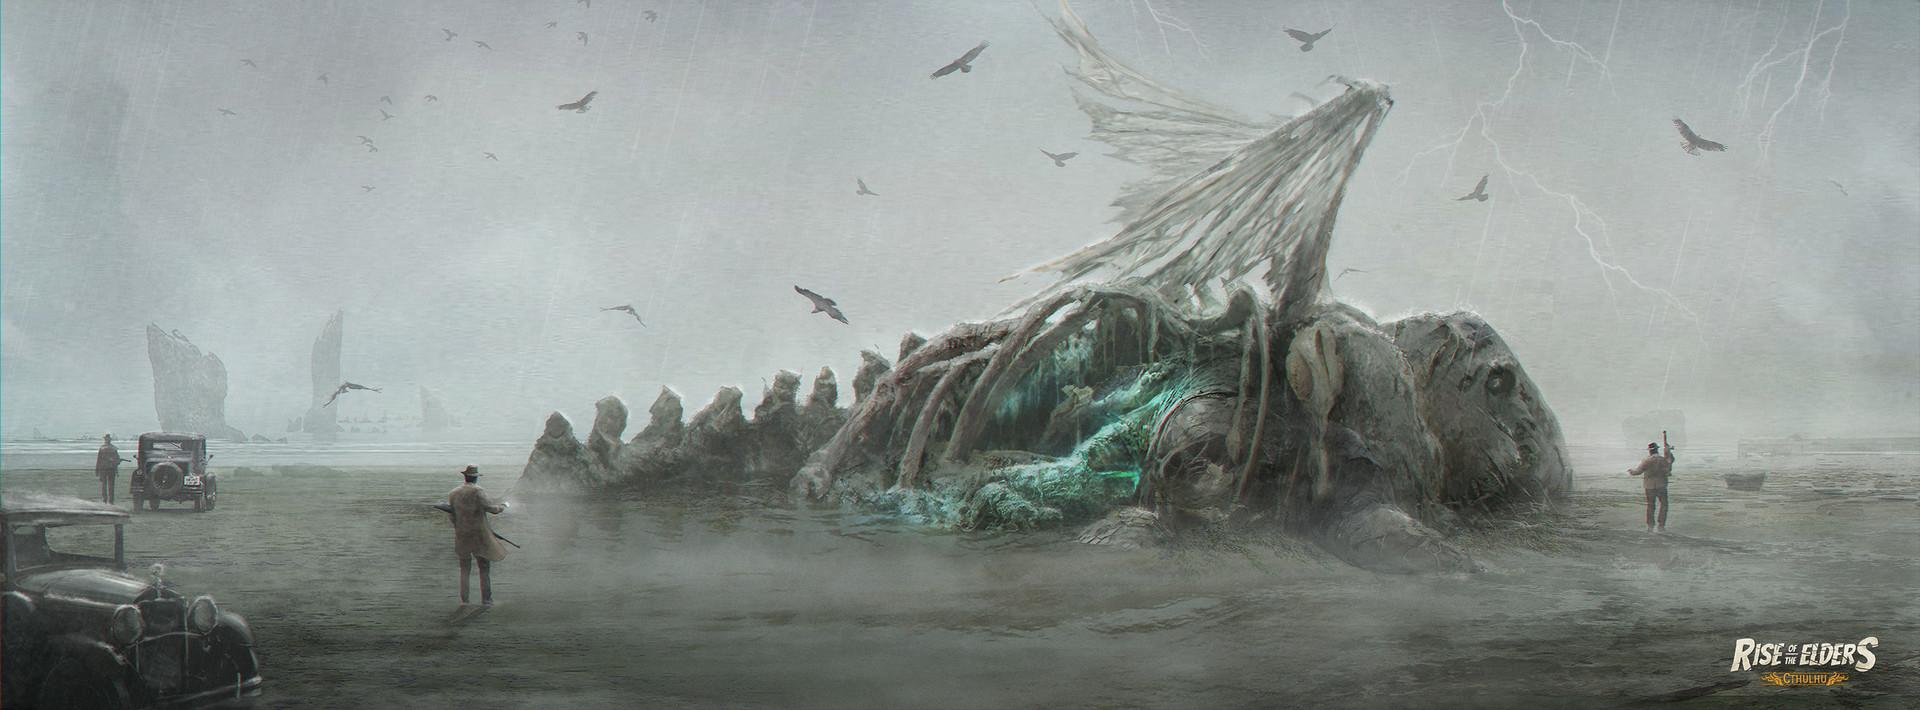 Rise of the Elders : Cthulhu